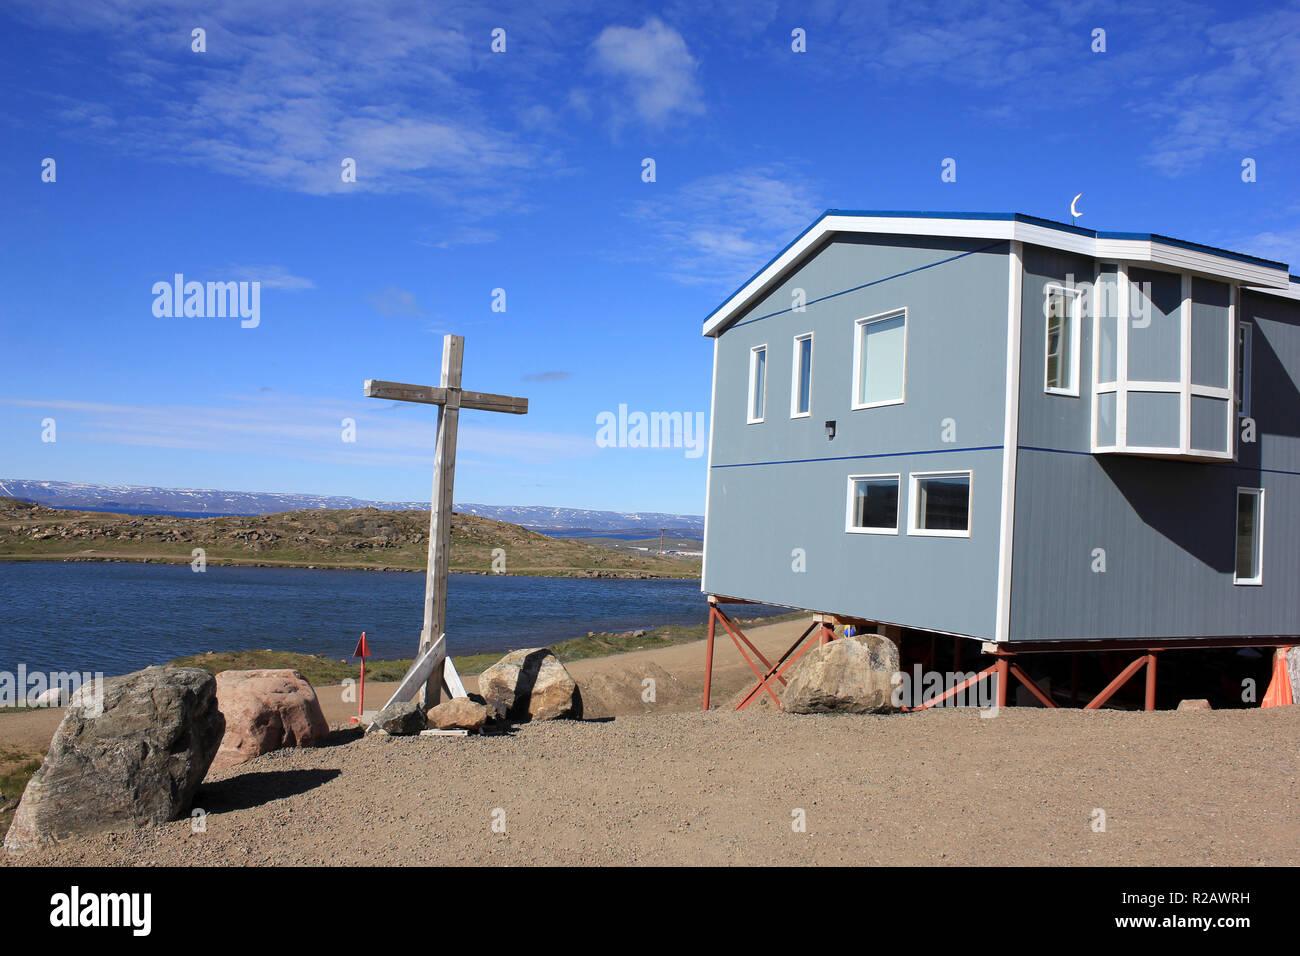 Iqaluit, Nunavut Canada - Stock Image